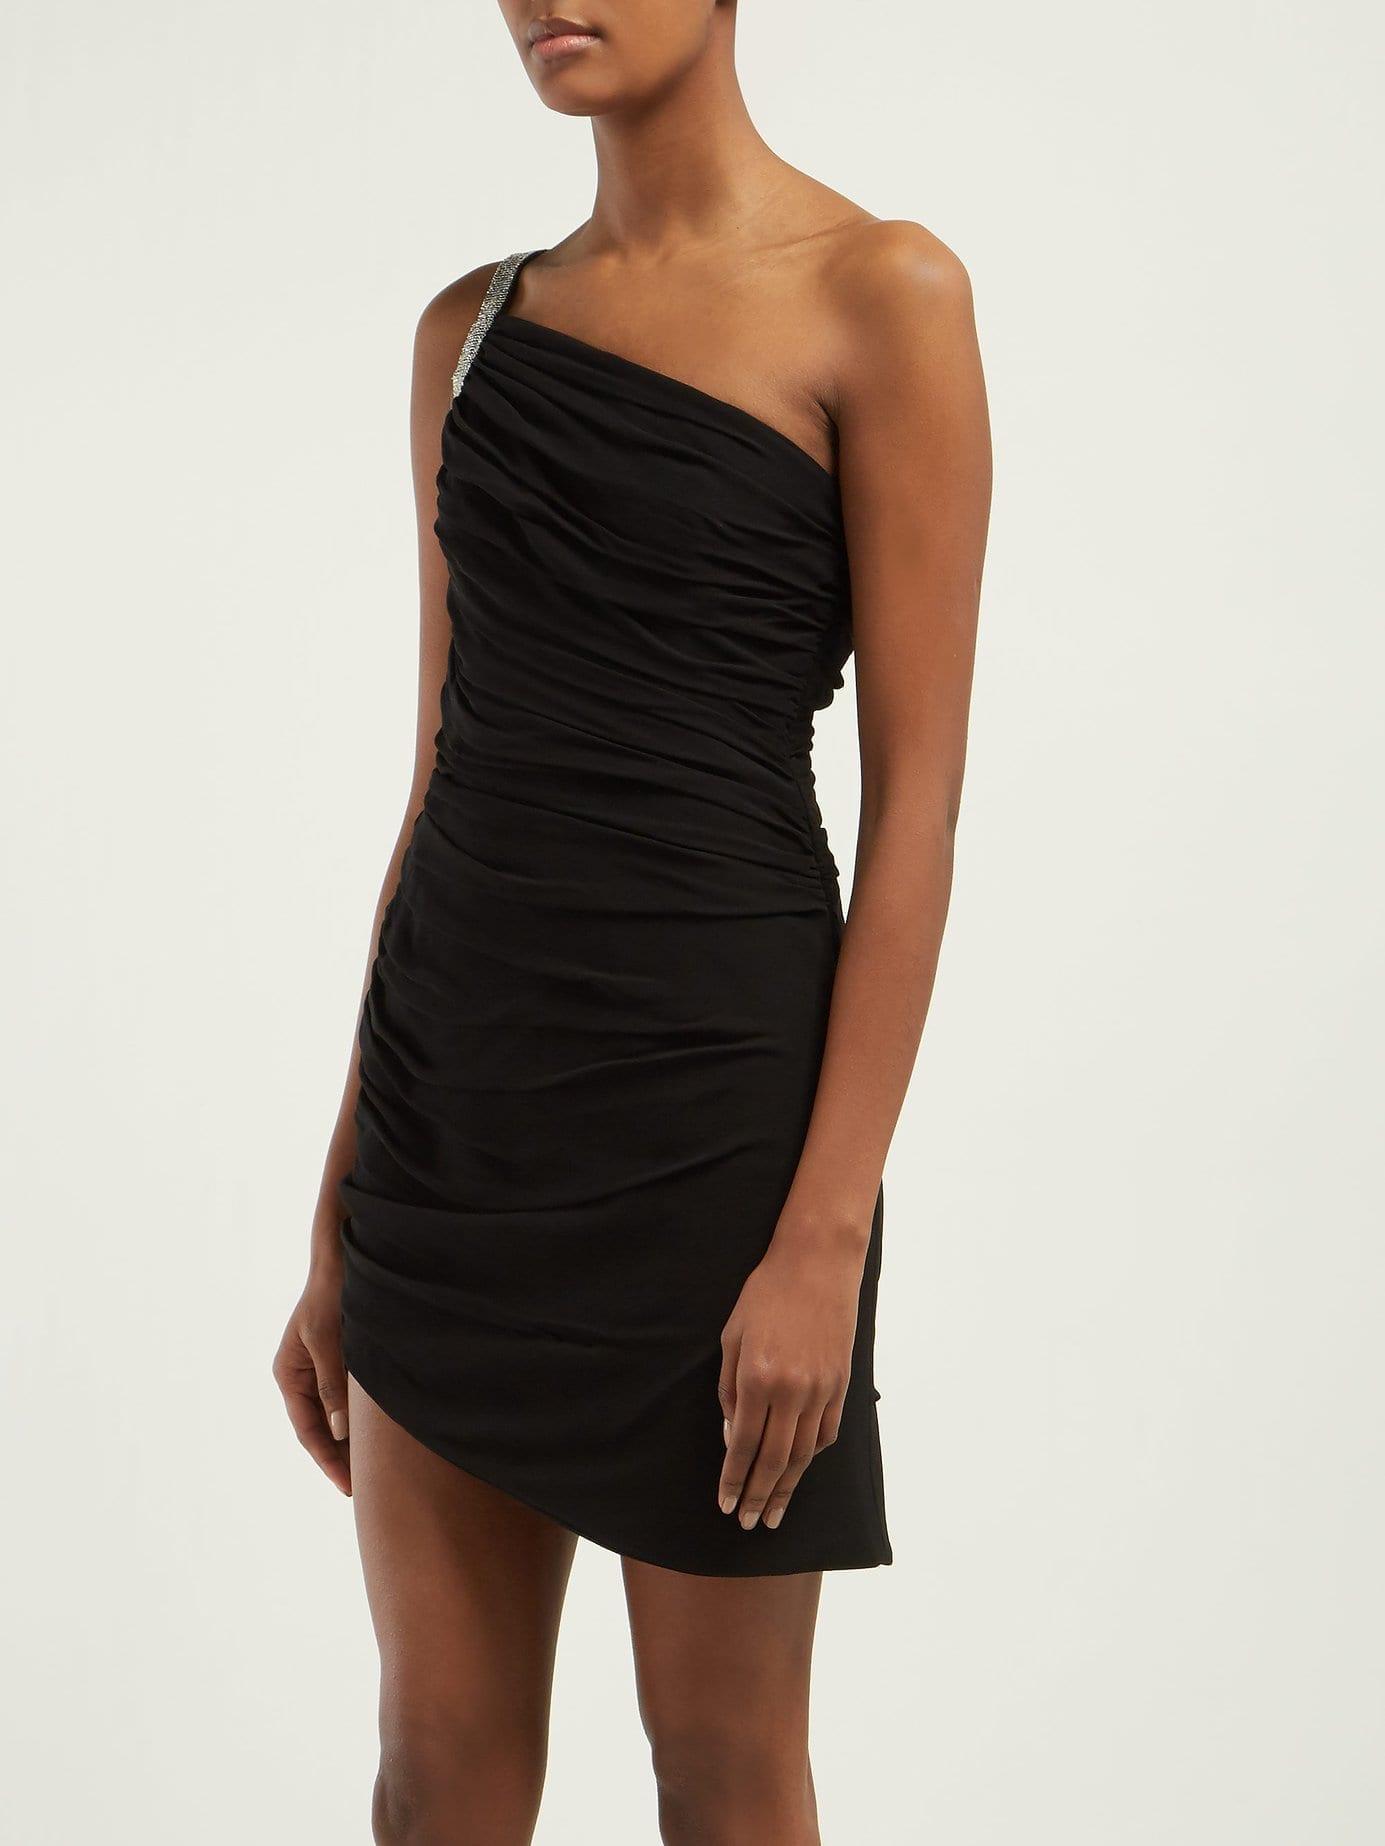 b708143c198 SAINT LAURENT One-shoulder Ruched Crepe Mini Black Dress - We Select ...